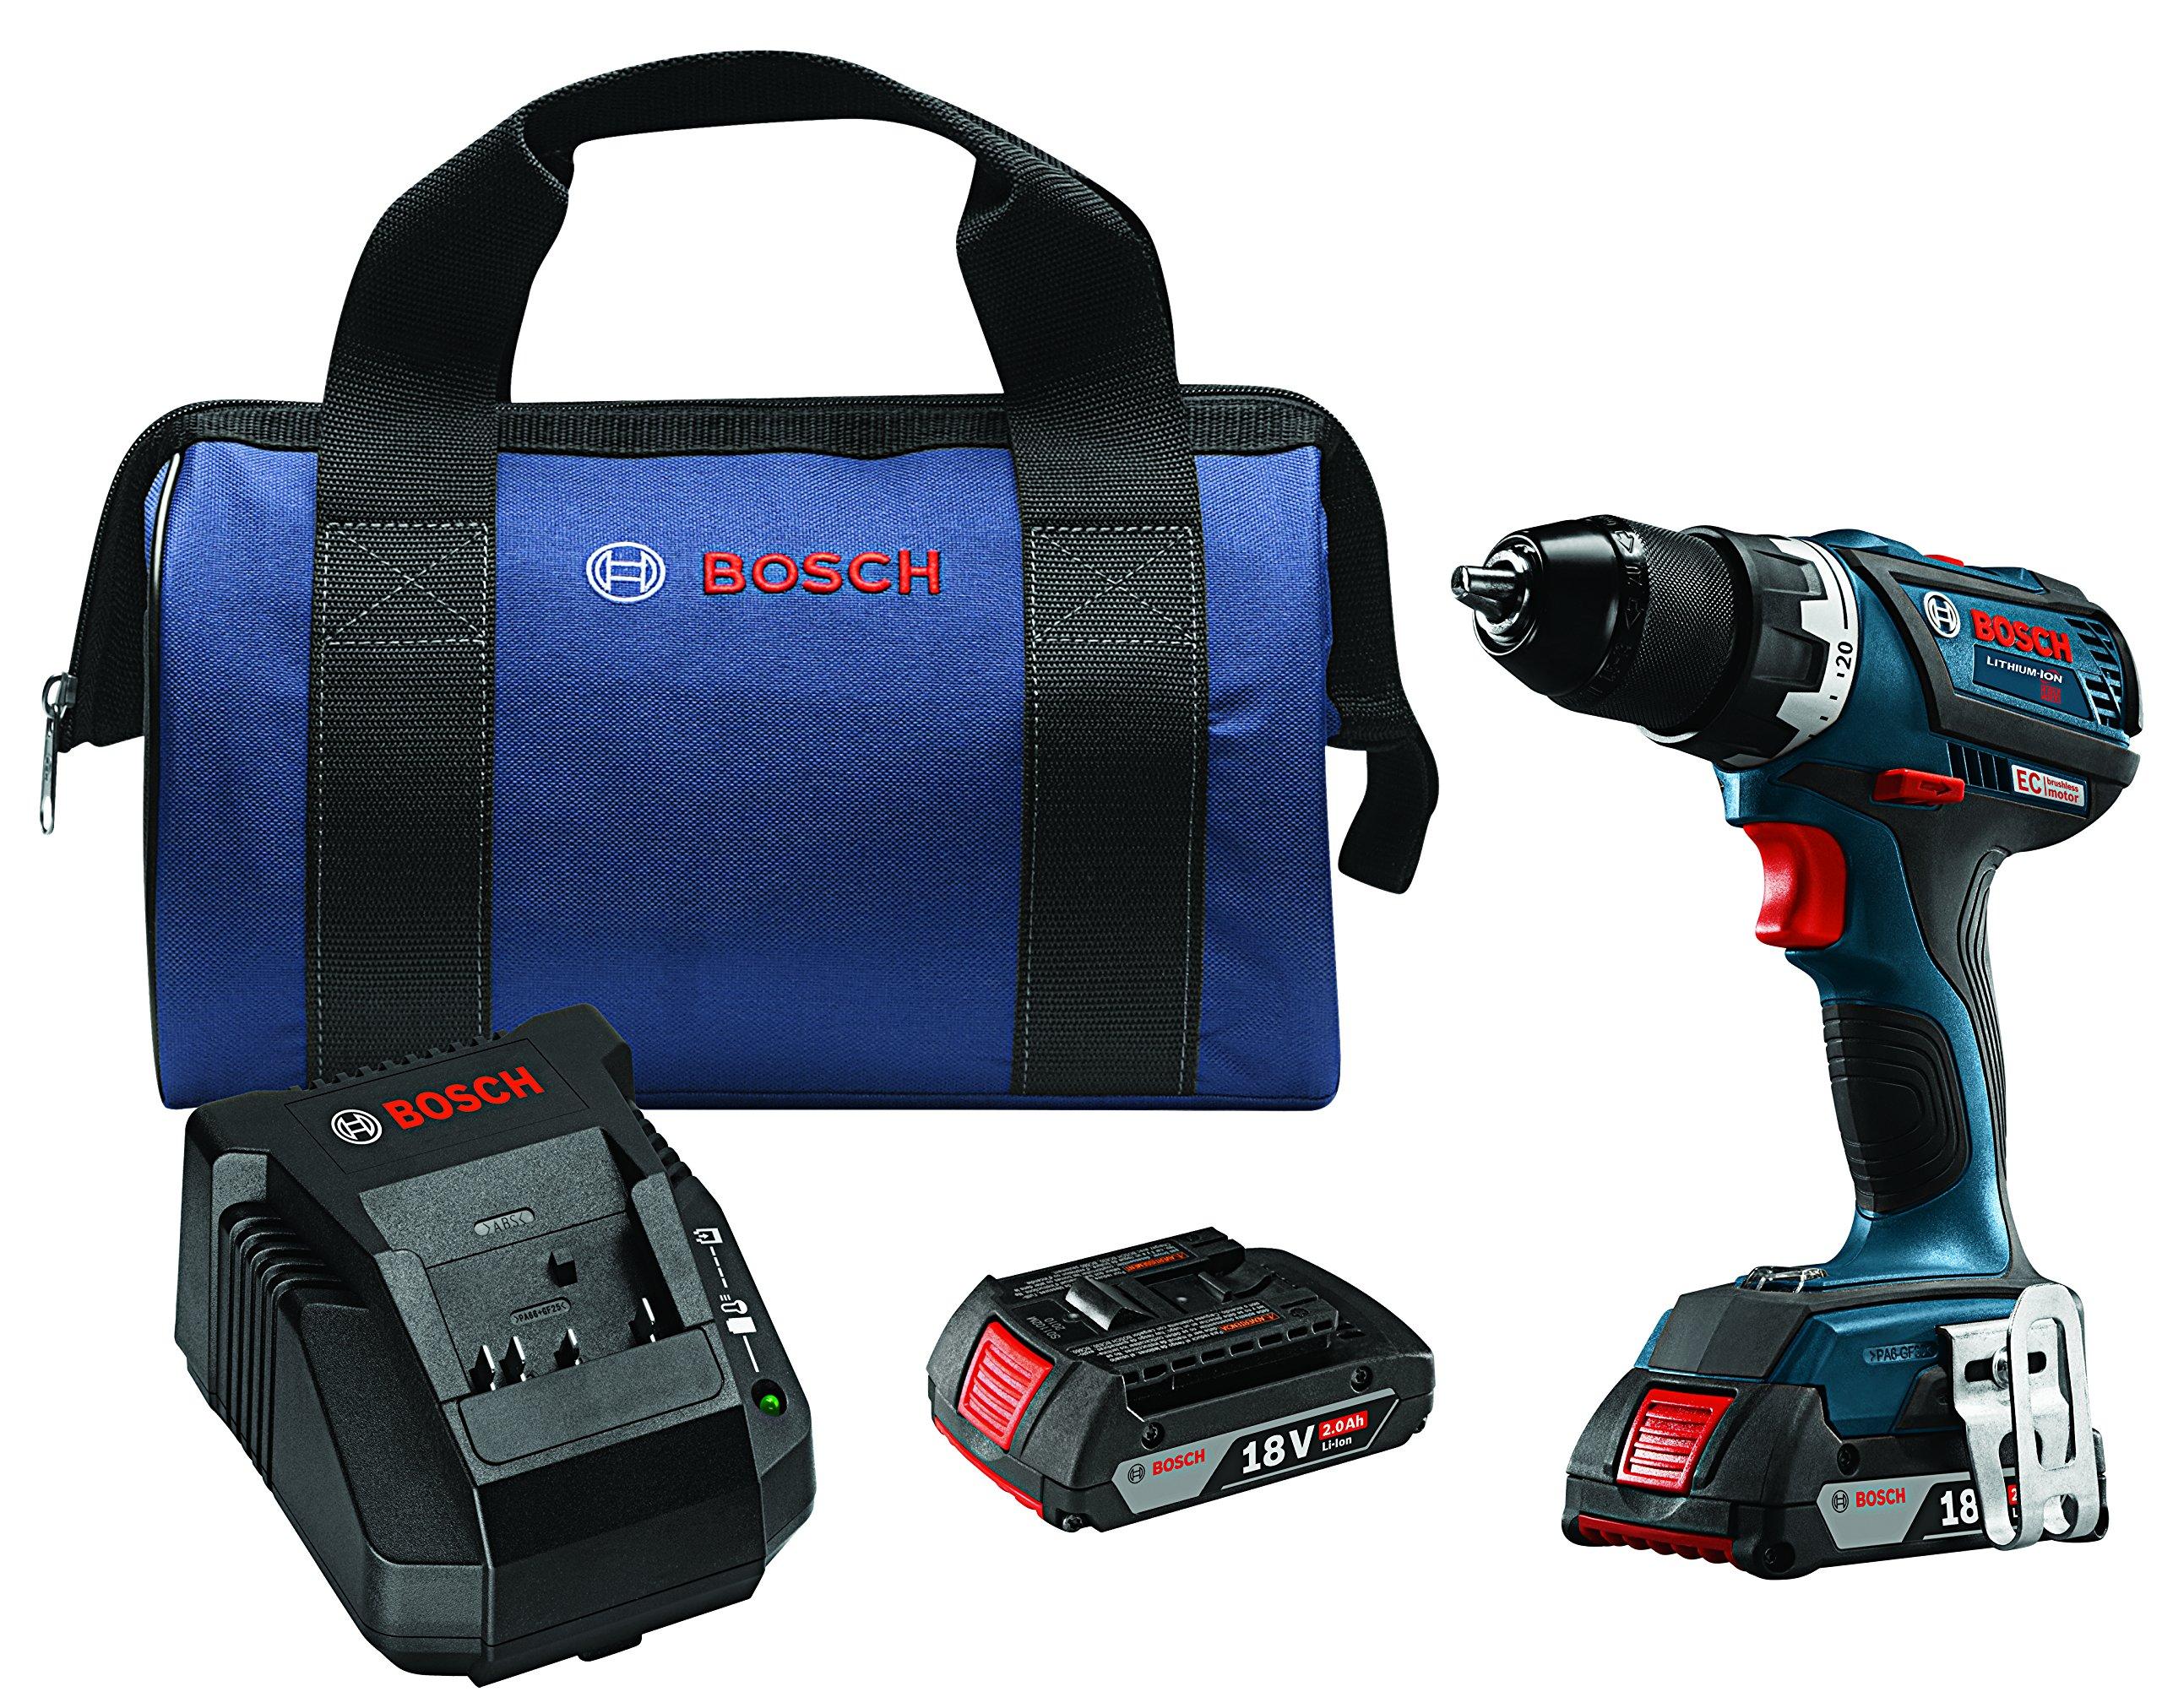 Bosch DDS183-02 18V EC Brushless Compact Tough 1/2'' Drill/Driver Kit